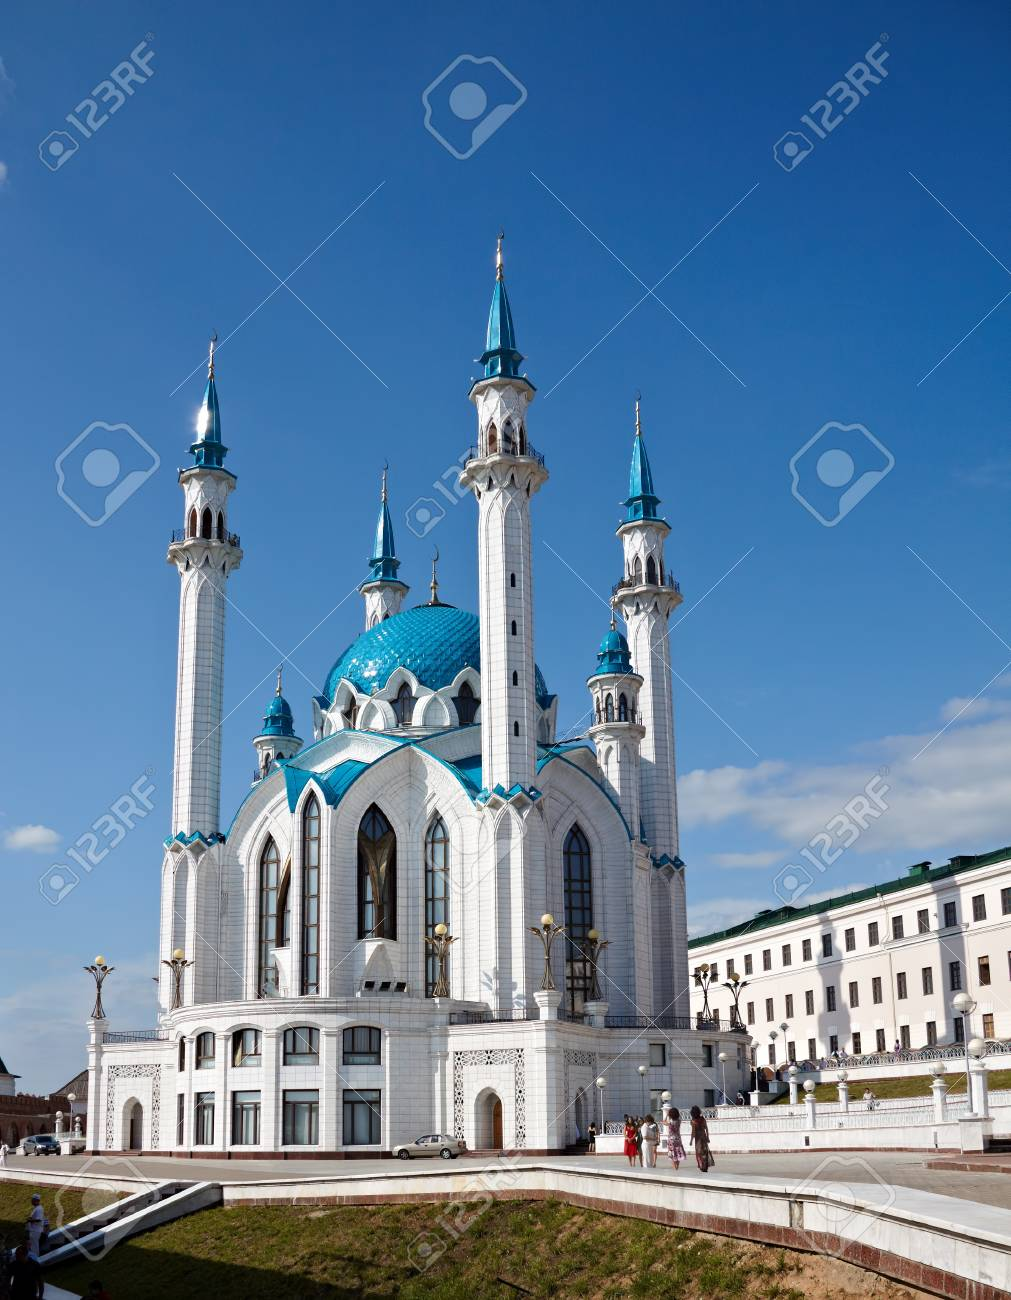 Where to walk in Kazan: interesting places 68